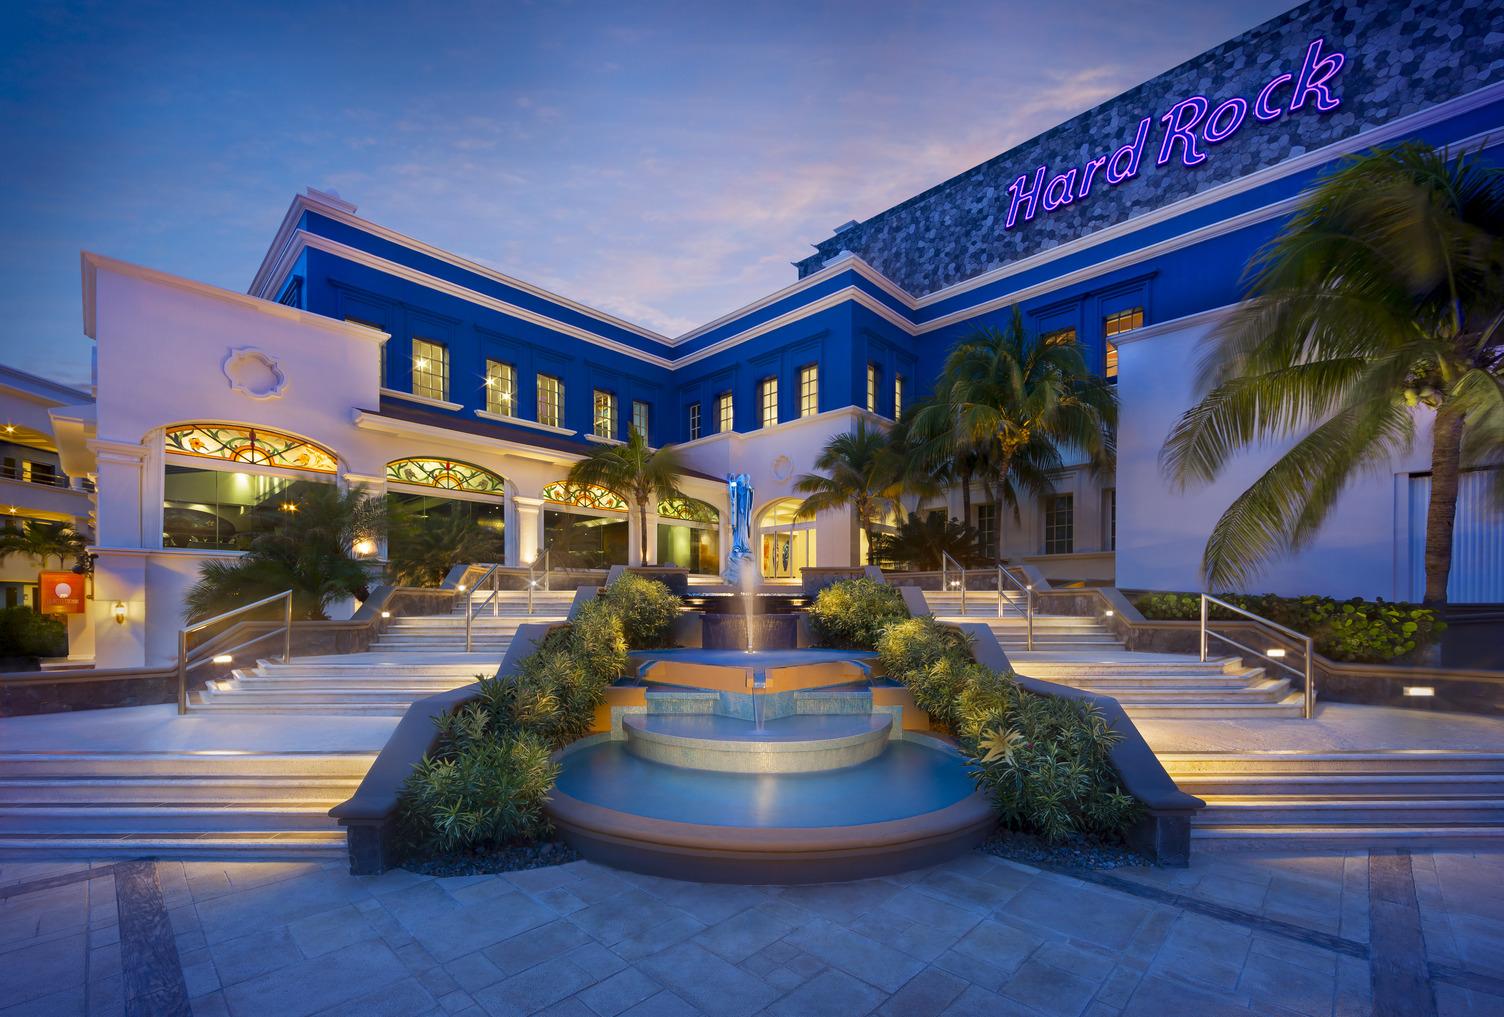 Travel Agency All-Inclusive Resort Heaven at Hard Rock Hotel Riviera Maya 06